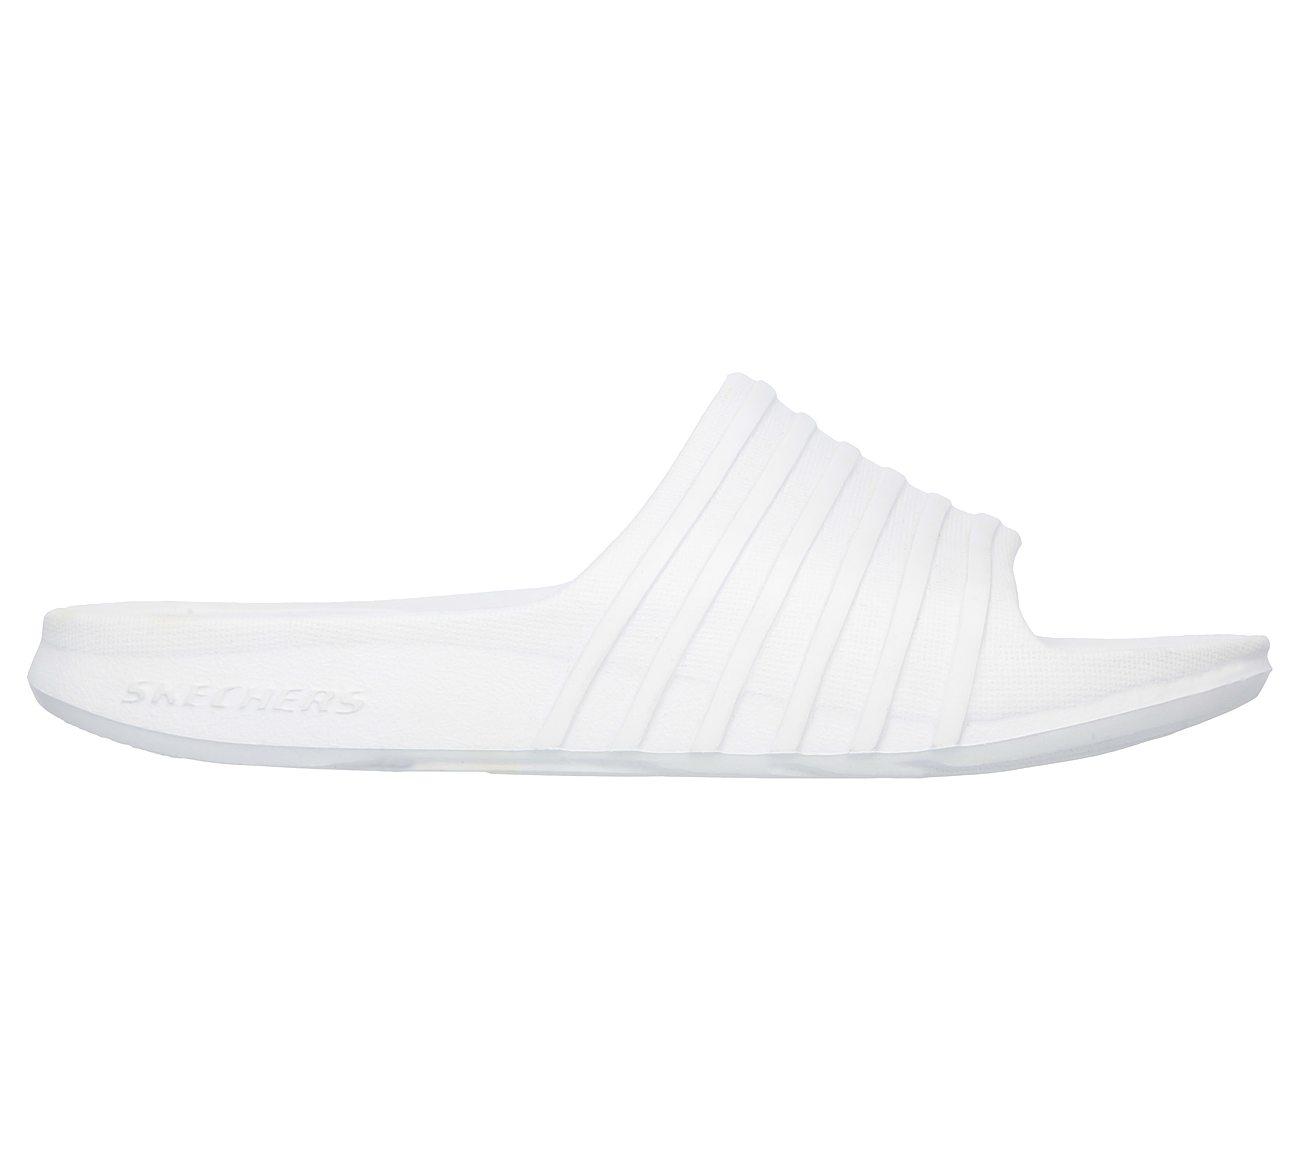 Skechers Shore Womens Slides Sandals